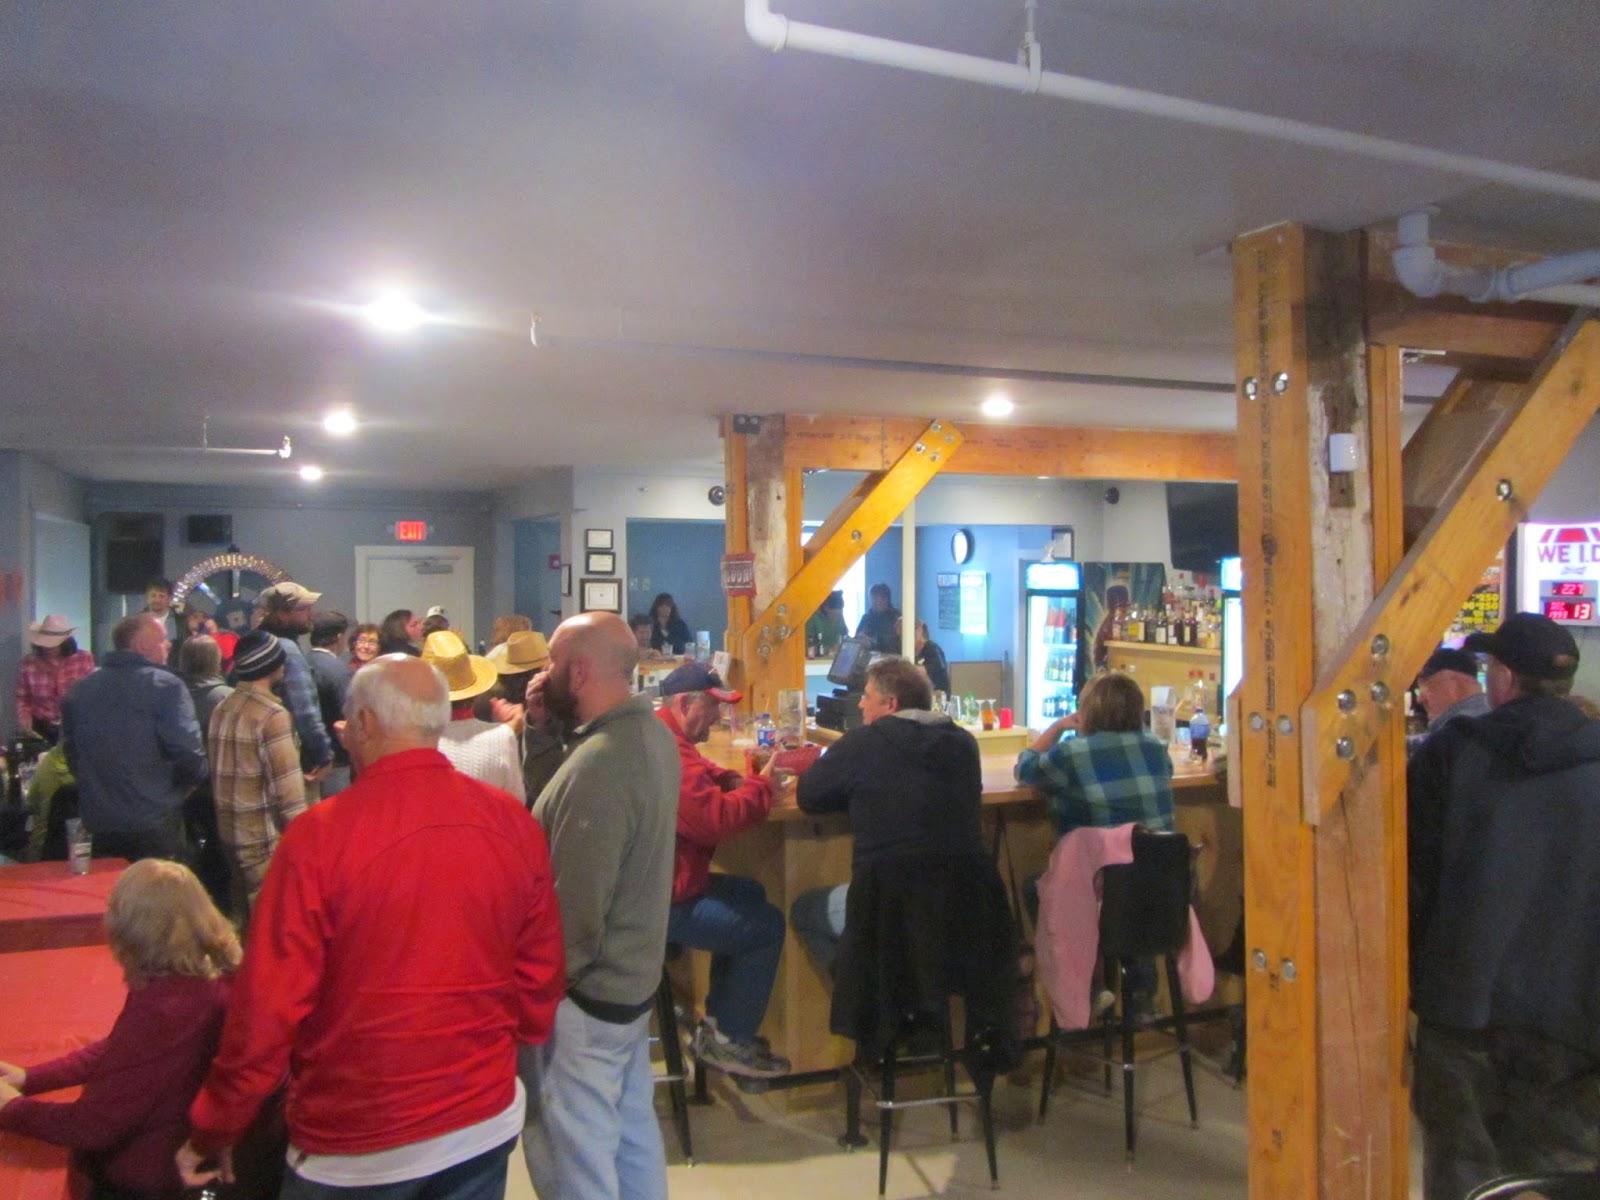 The Windham Eagle: Eagles Club new location motivates fundraiser